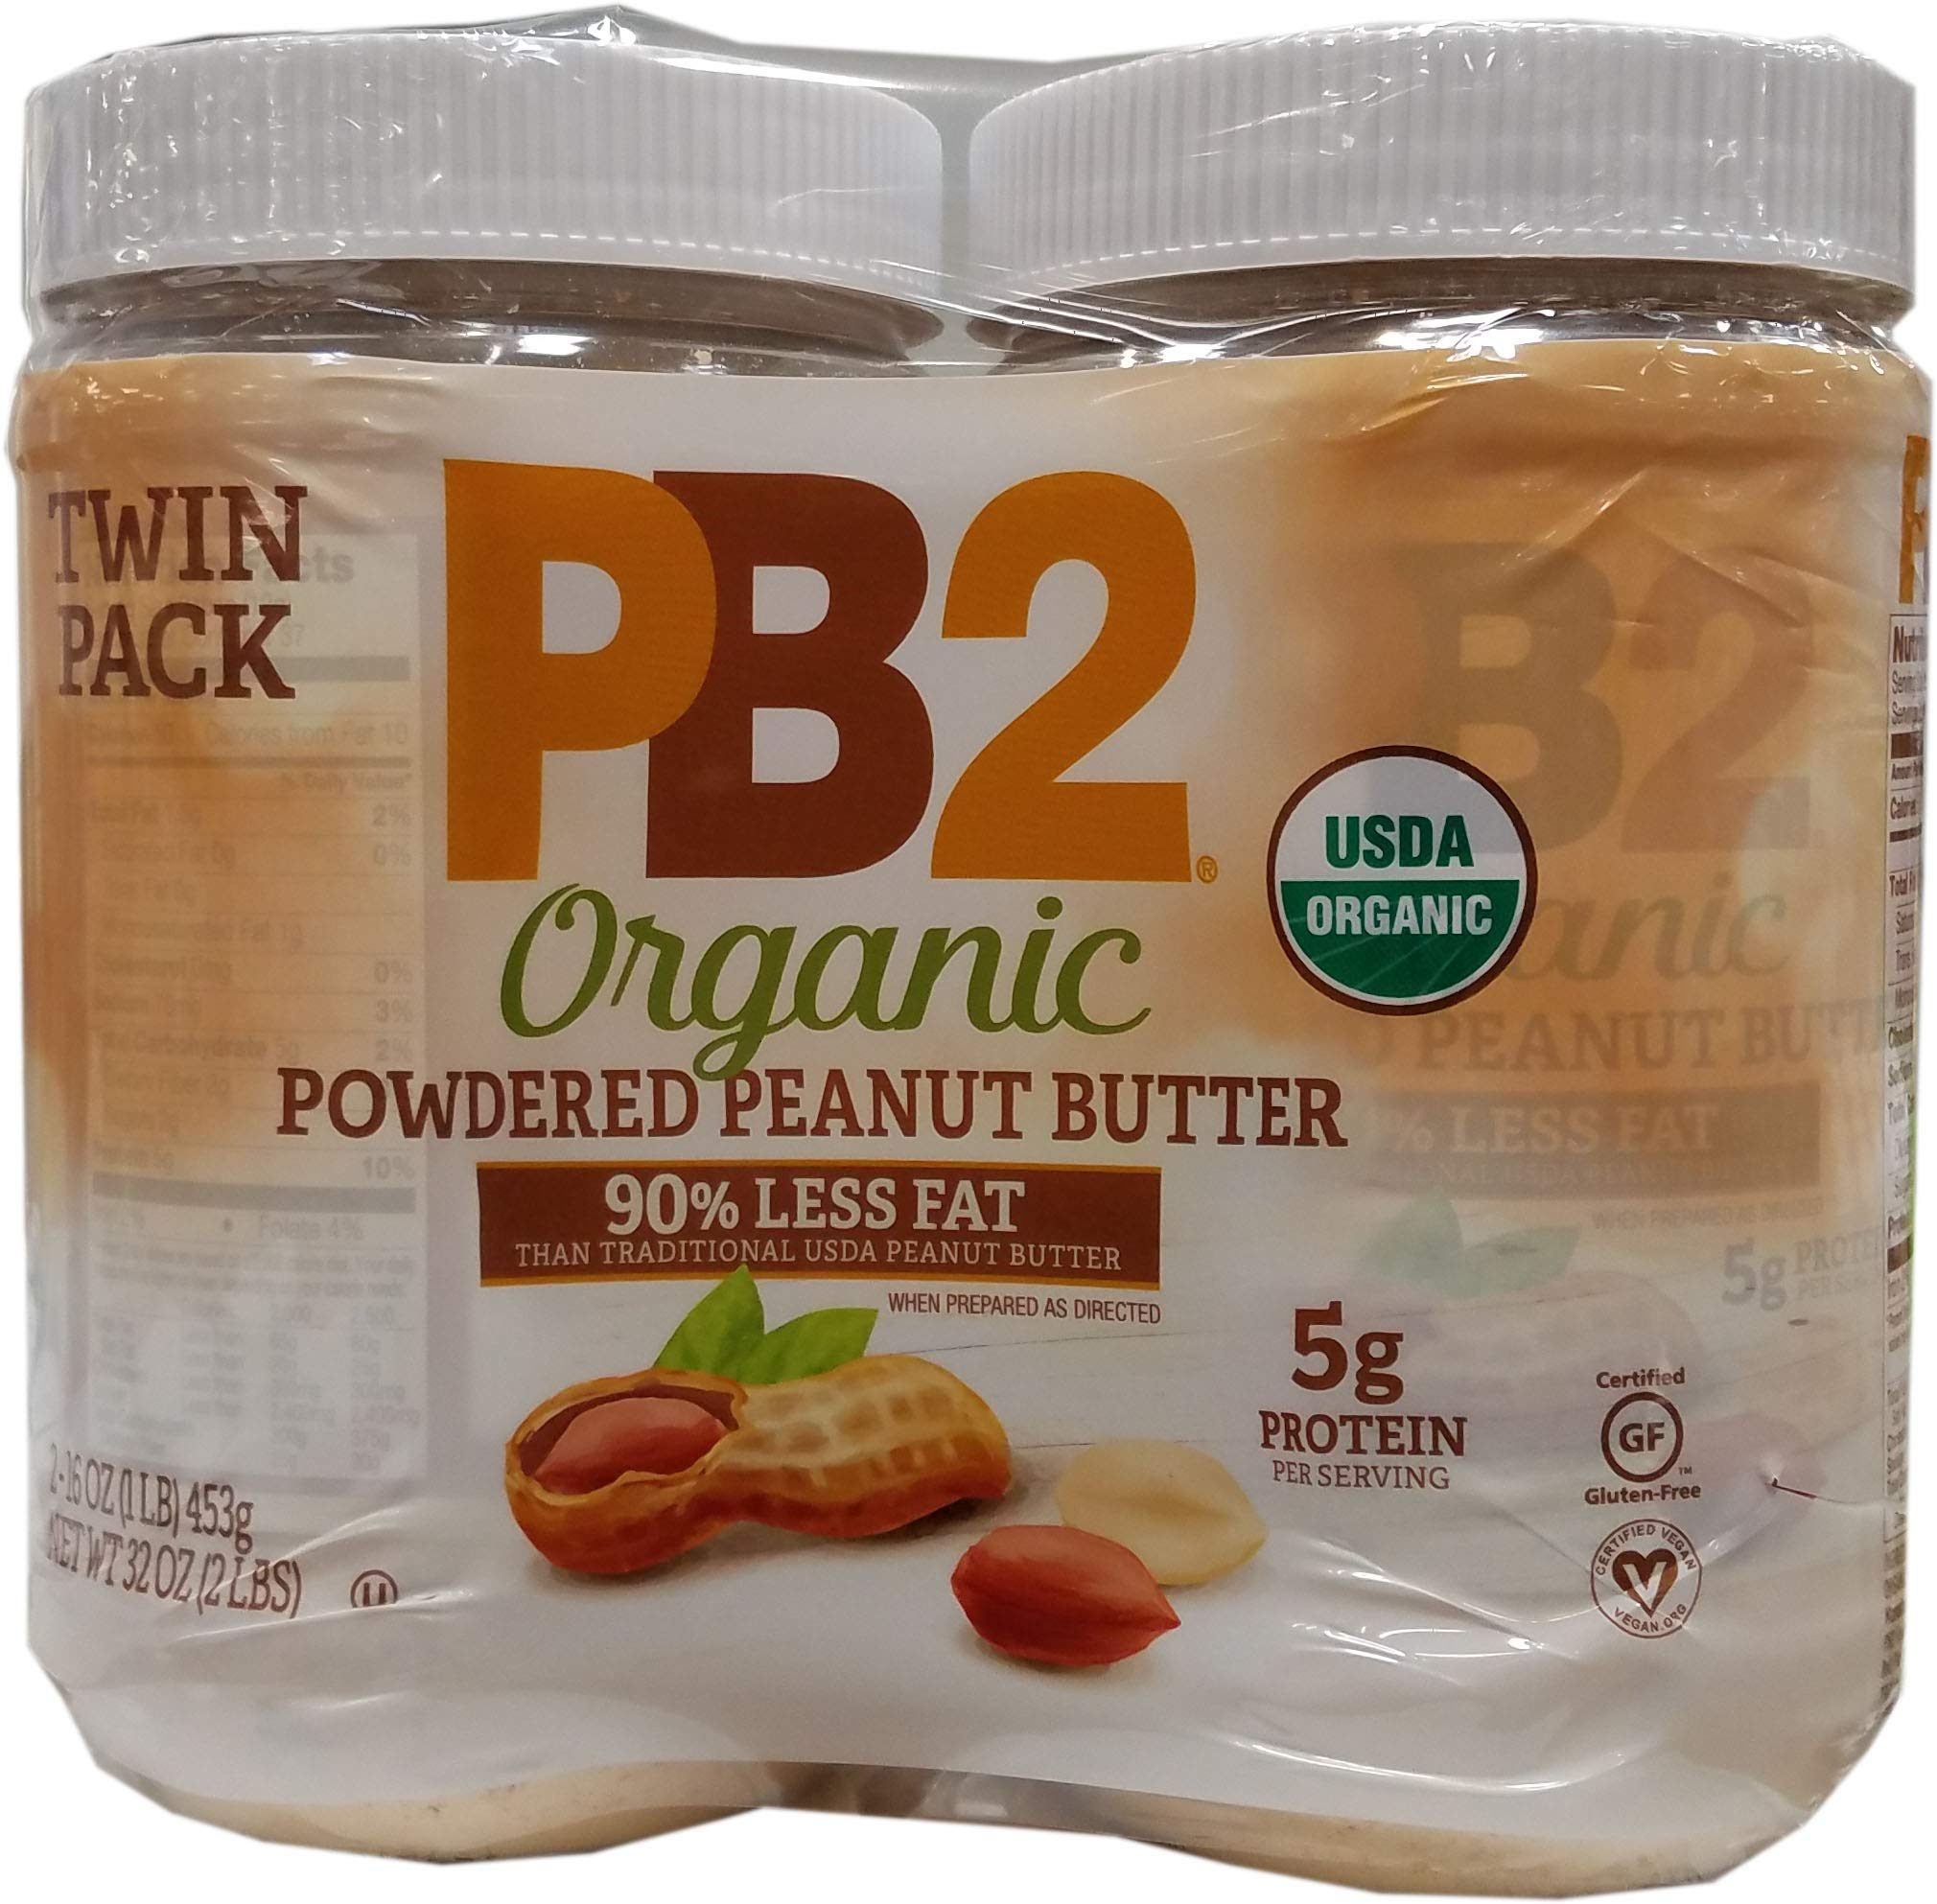 PB2 Organic Powdered Peanut Butter (2/16 Ounce)(Net Wt 32 Ounce), 32 Ounce